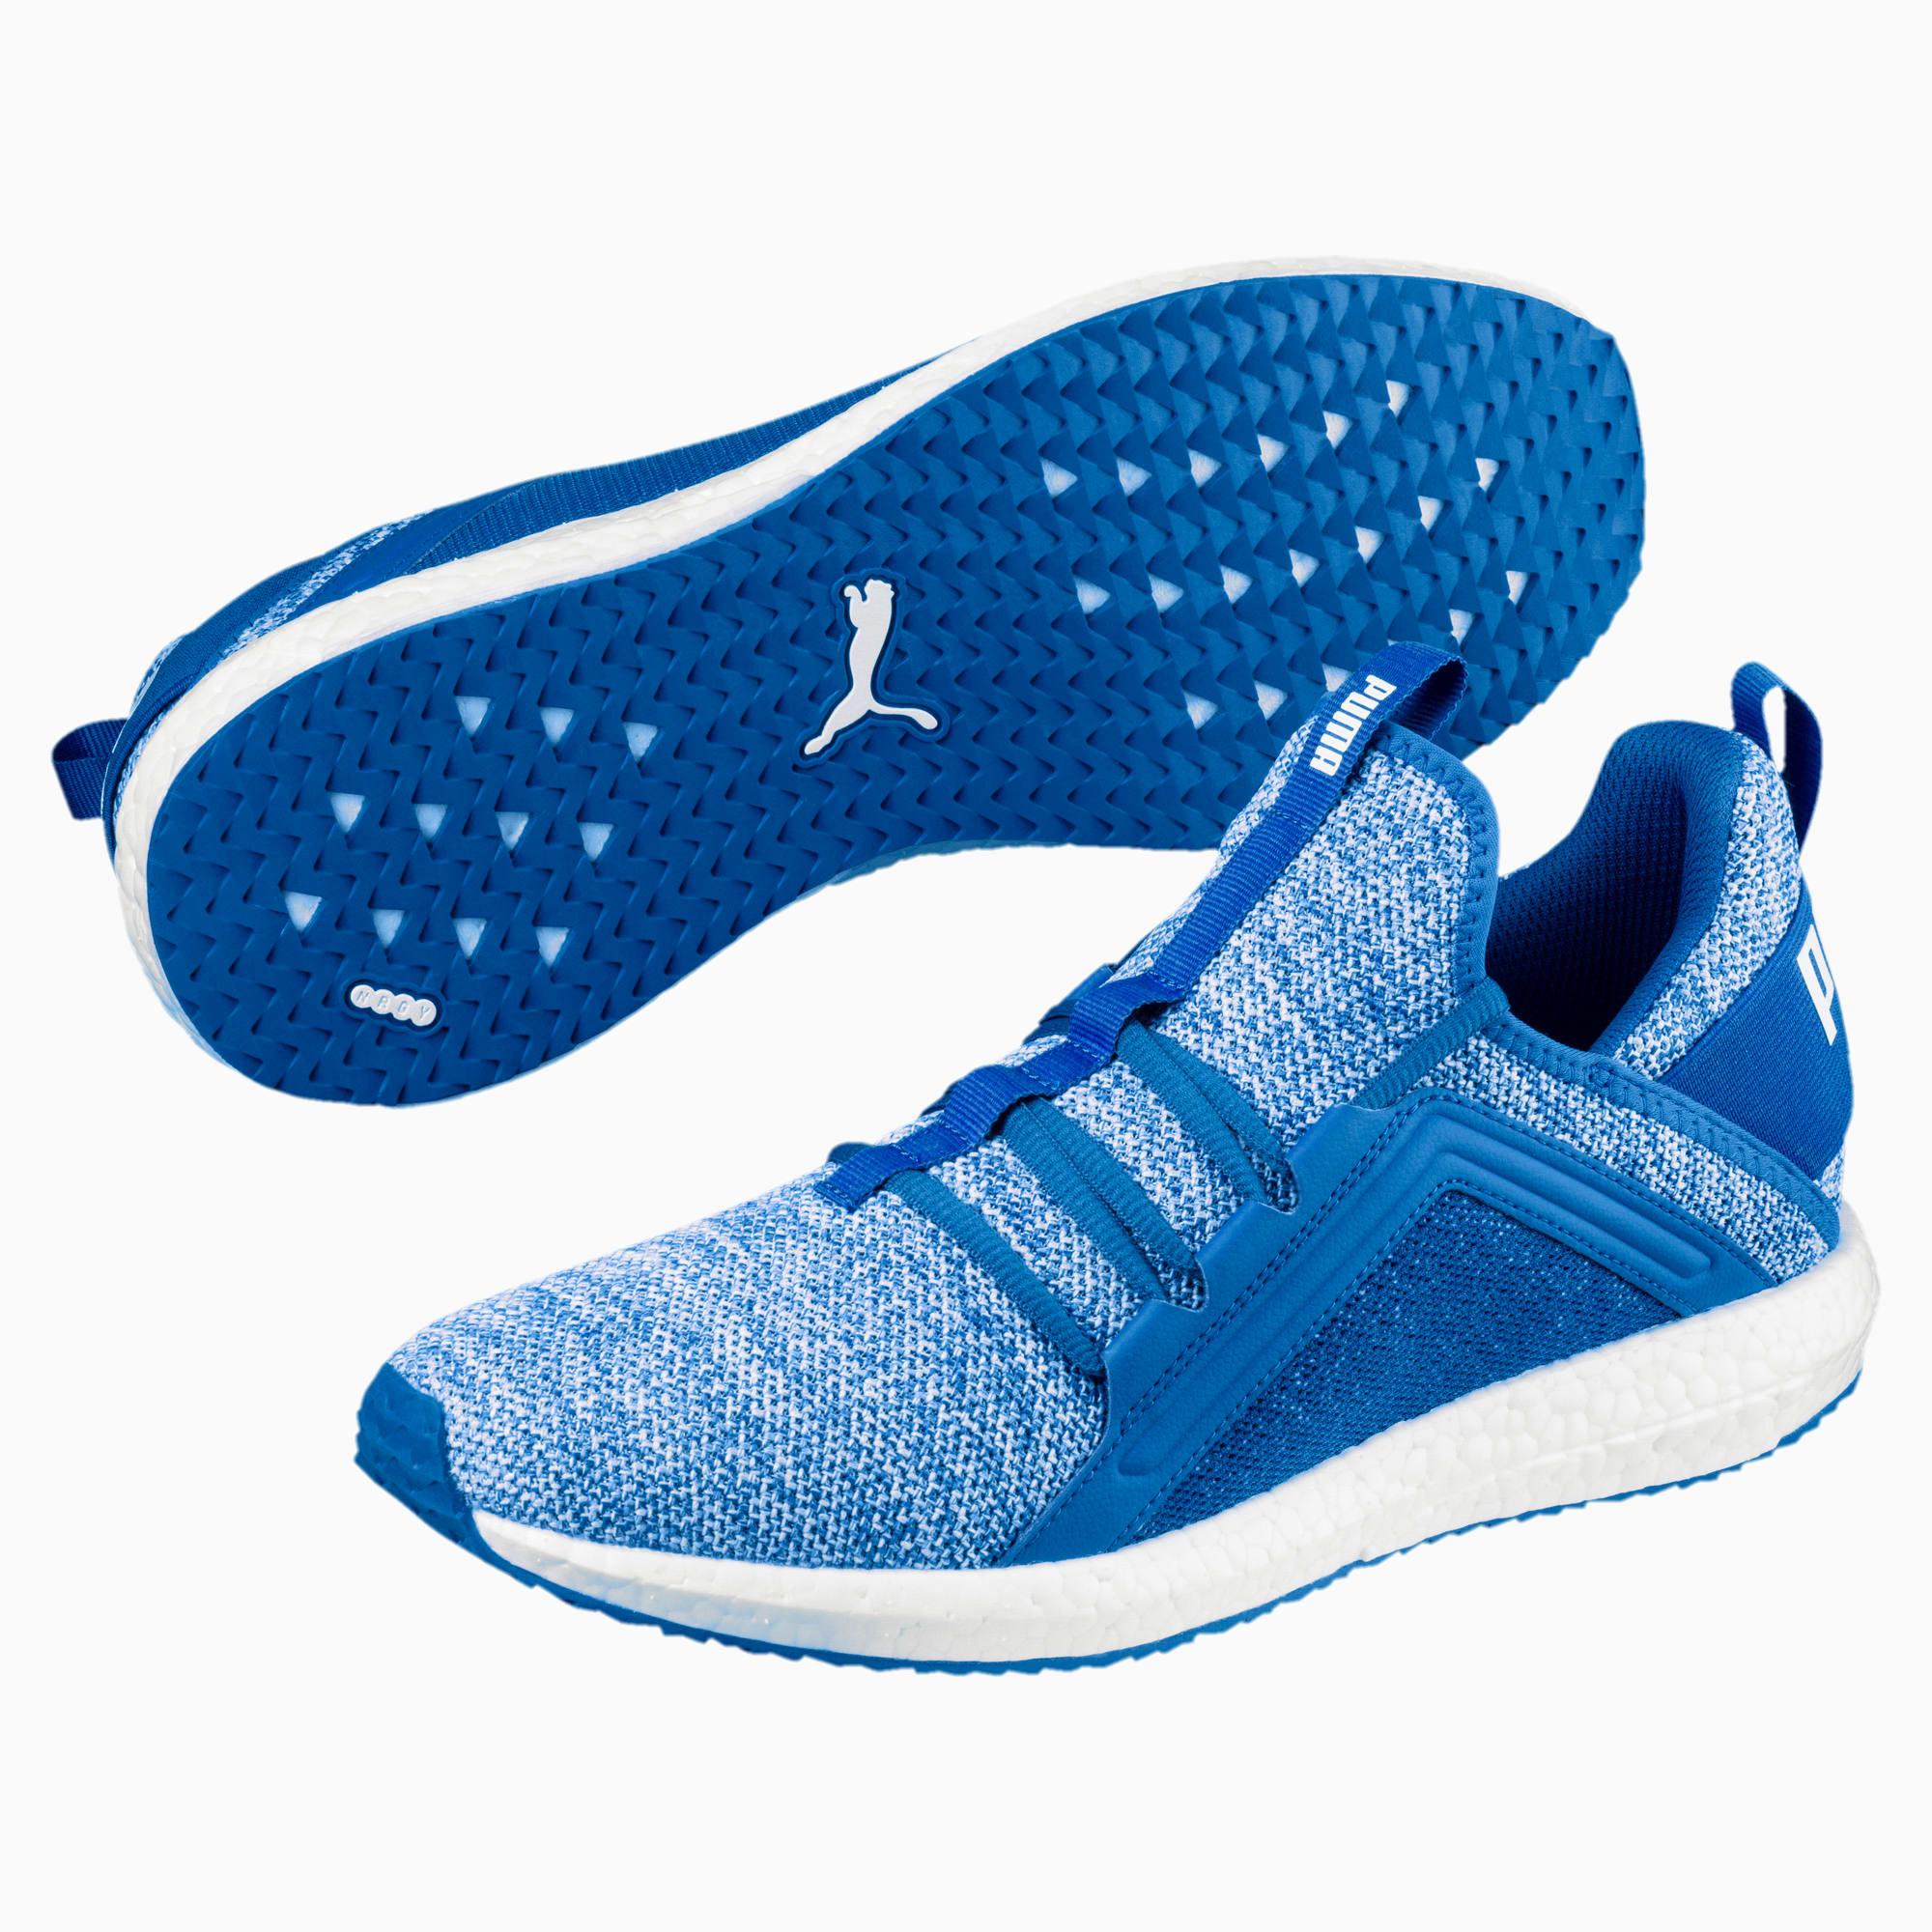 Mega NRGY Knit Men's Running Shoes